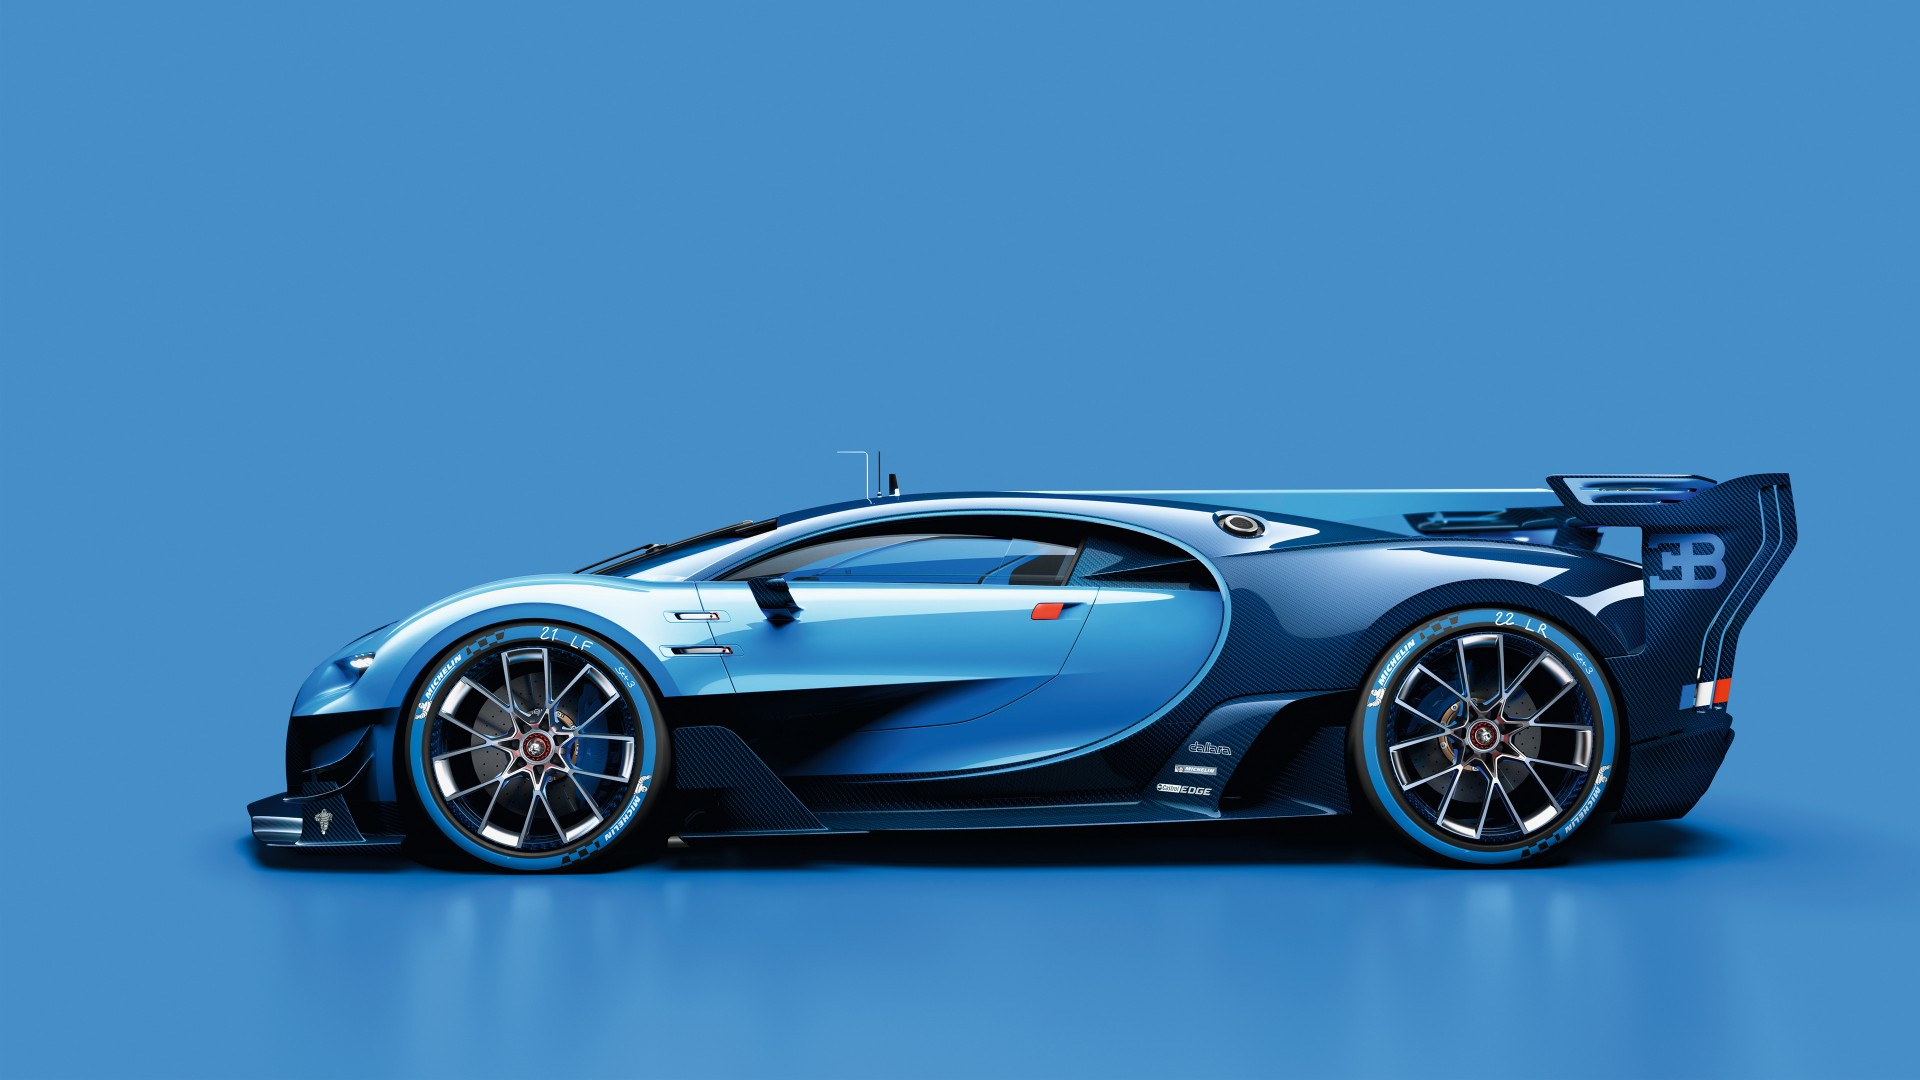 Mercedes Car Wallpapers For Windows 7 2015 Bugatti Vision Gran Turismo 7 Wallpaper Hd Car